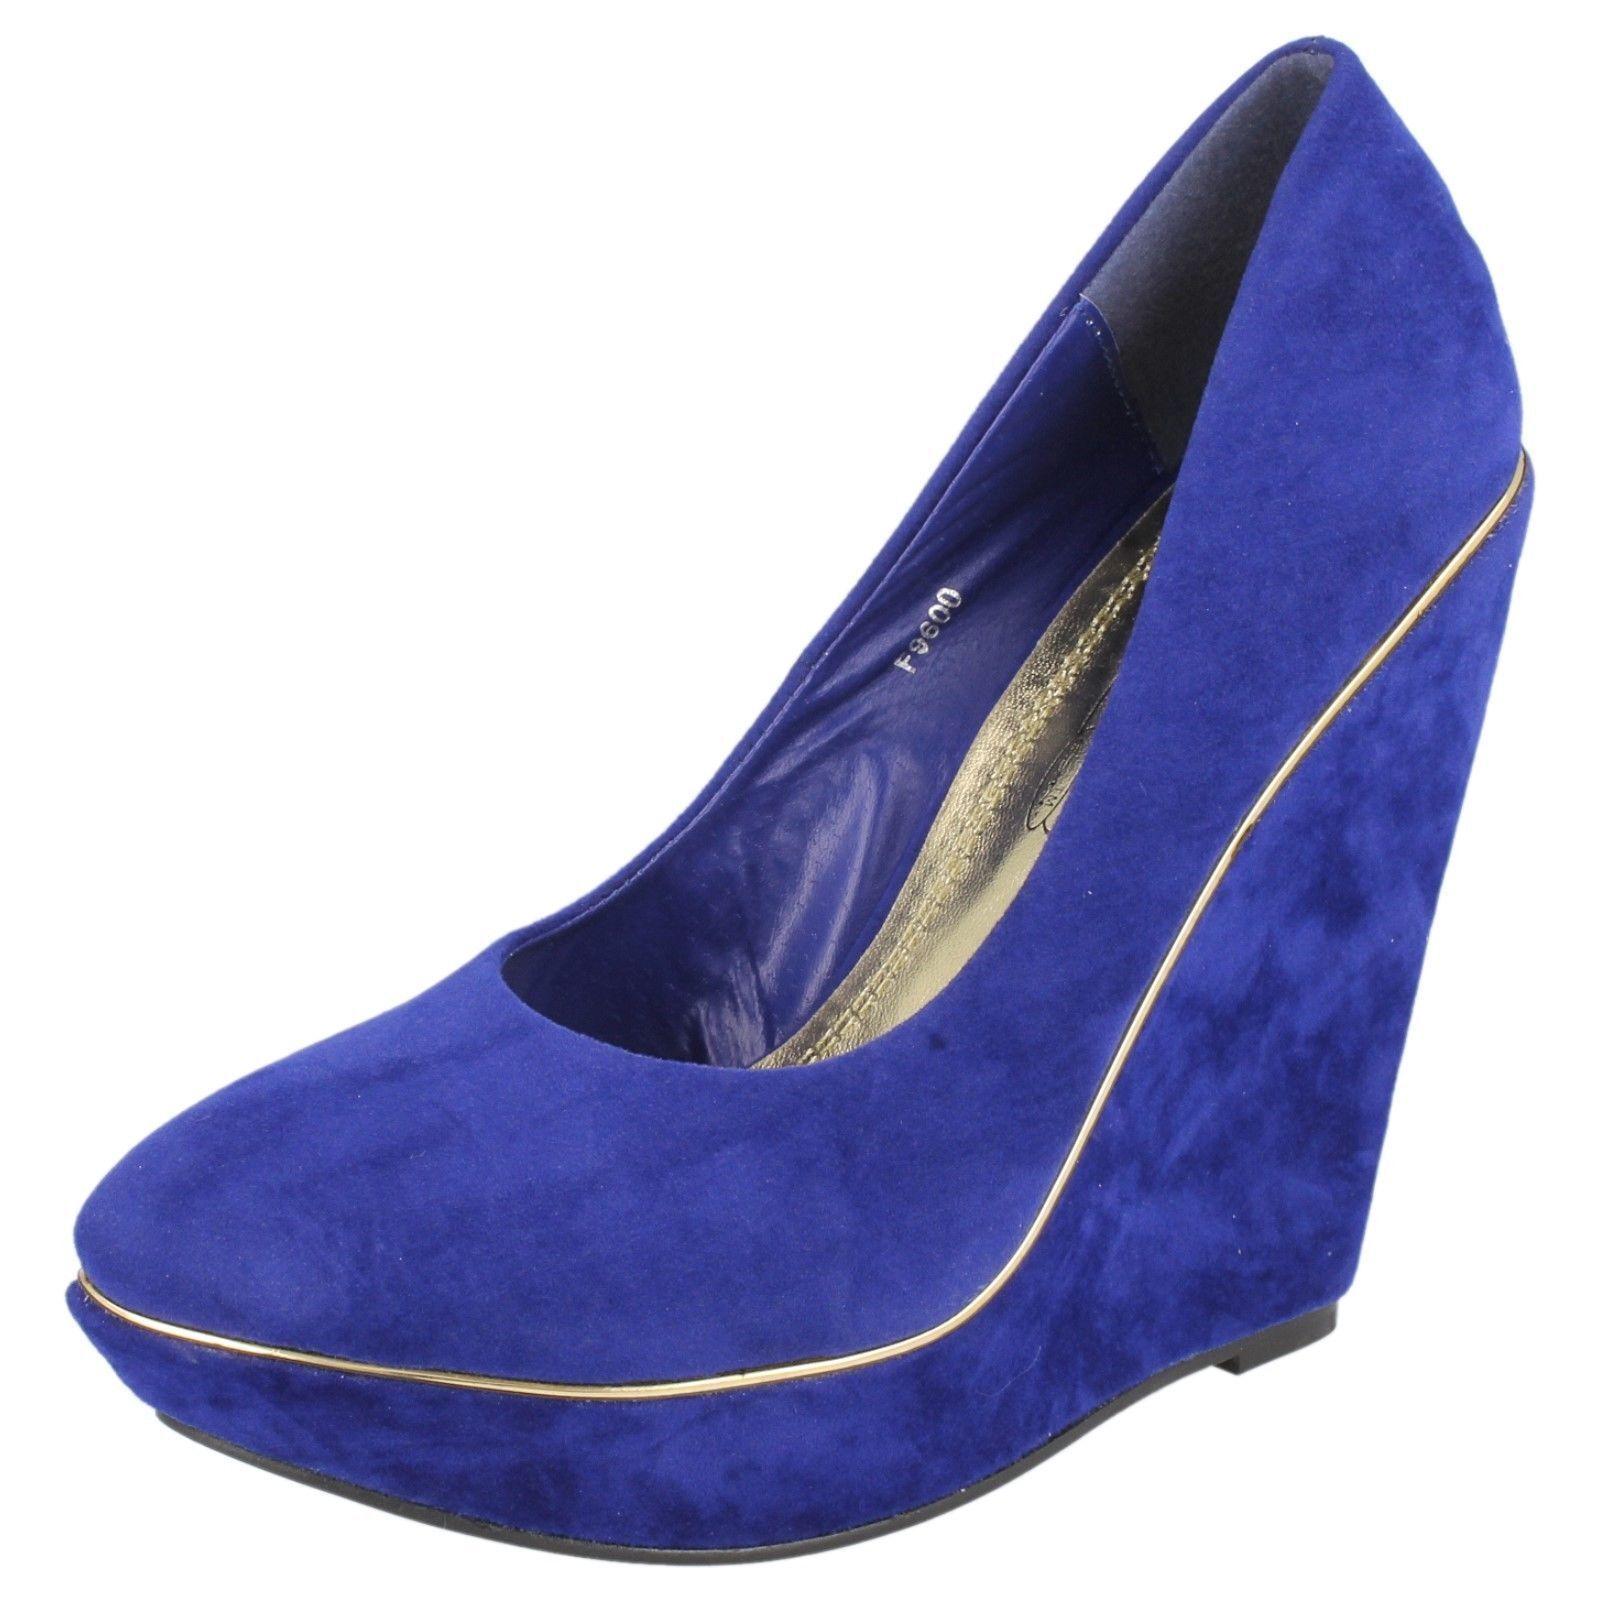 Moda jest prosta i niedroga Spot On f9600 femmes Bleu Faux Daim Semelle compensée à enfiler (r34b)( Kett )